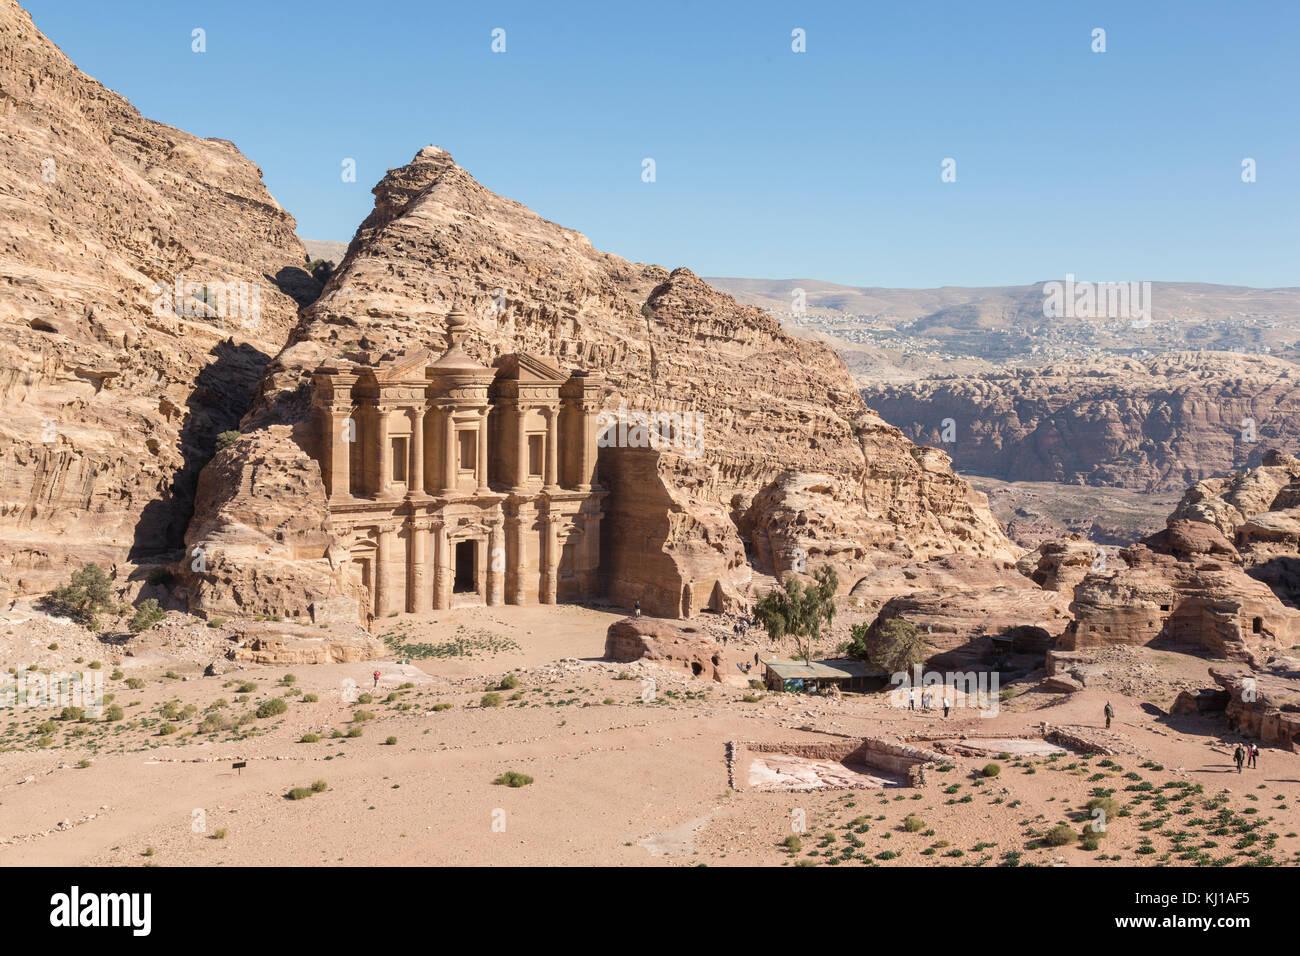 The Monastery Al Deir in Petra, Jordan - Stock Image